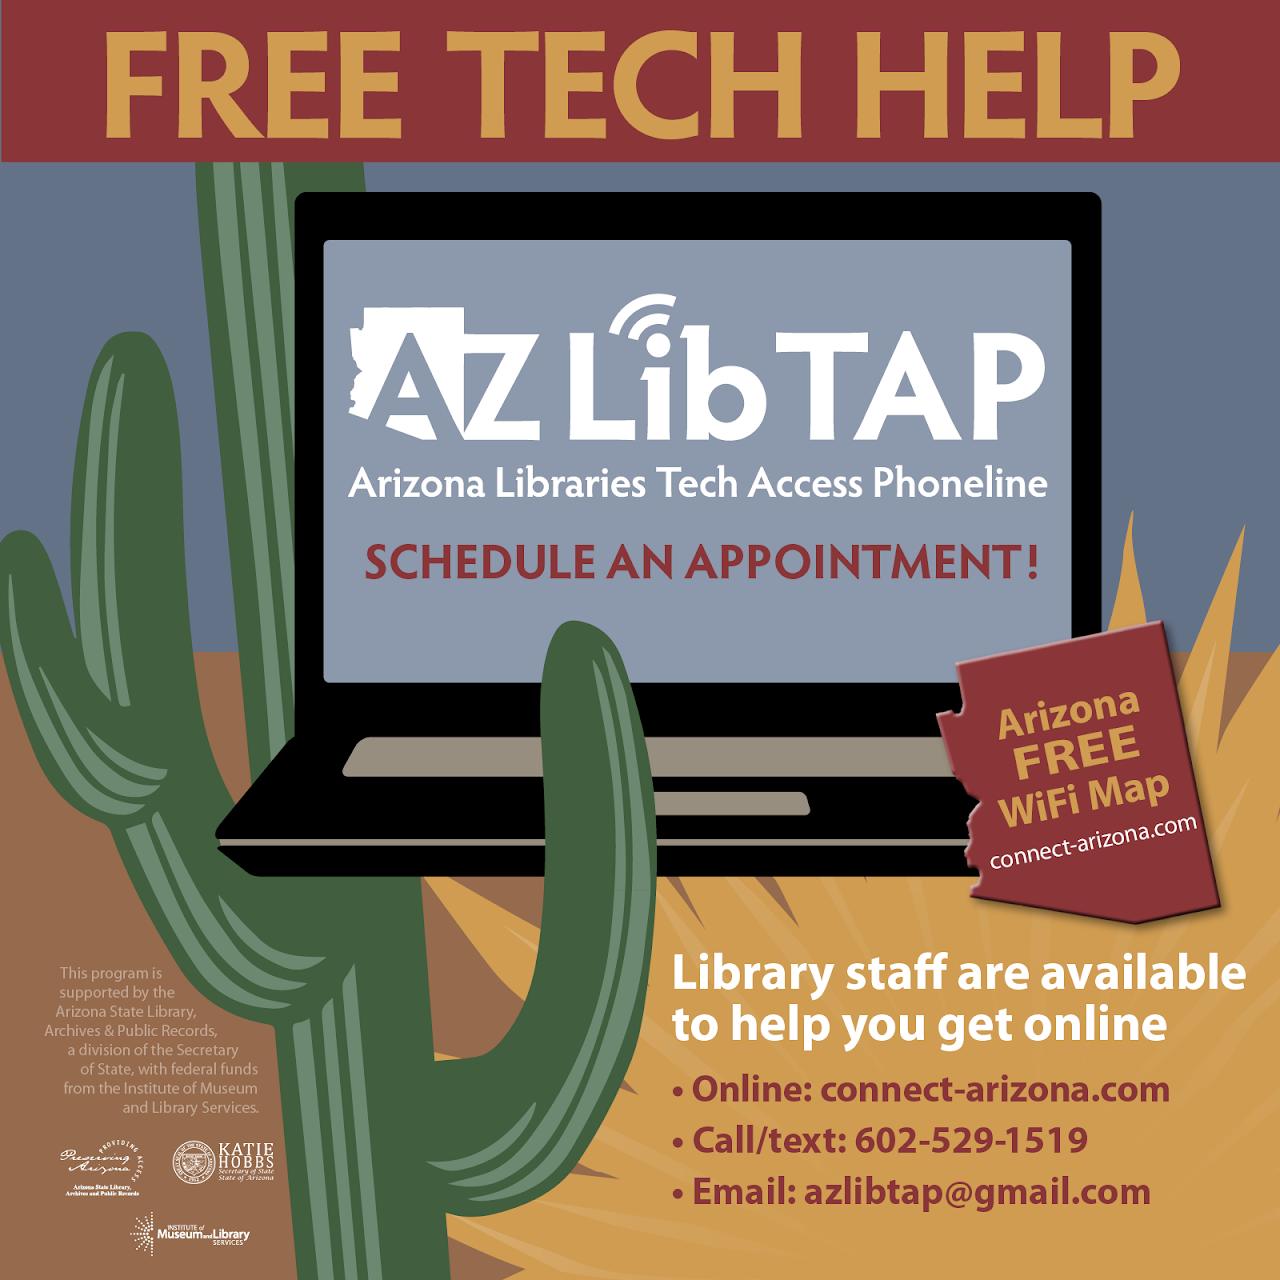 arizona tech help phone line image